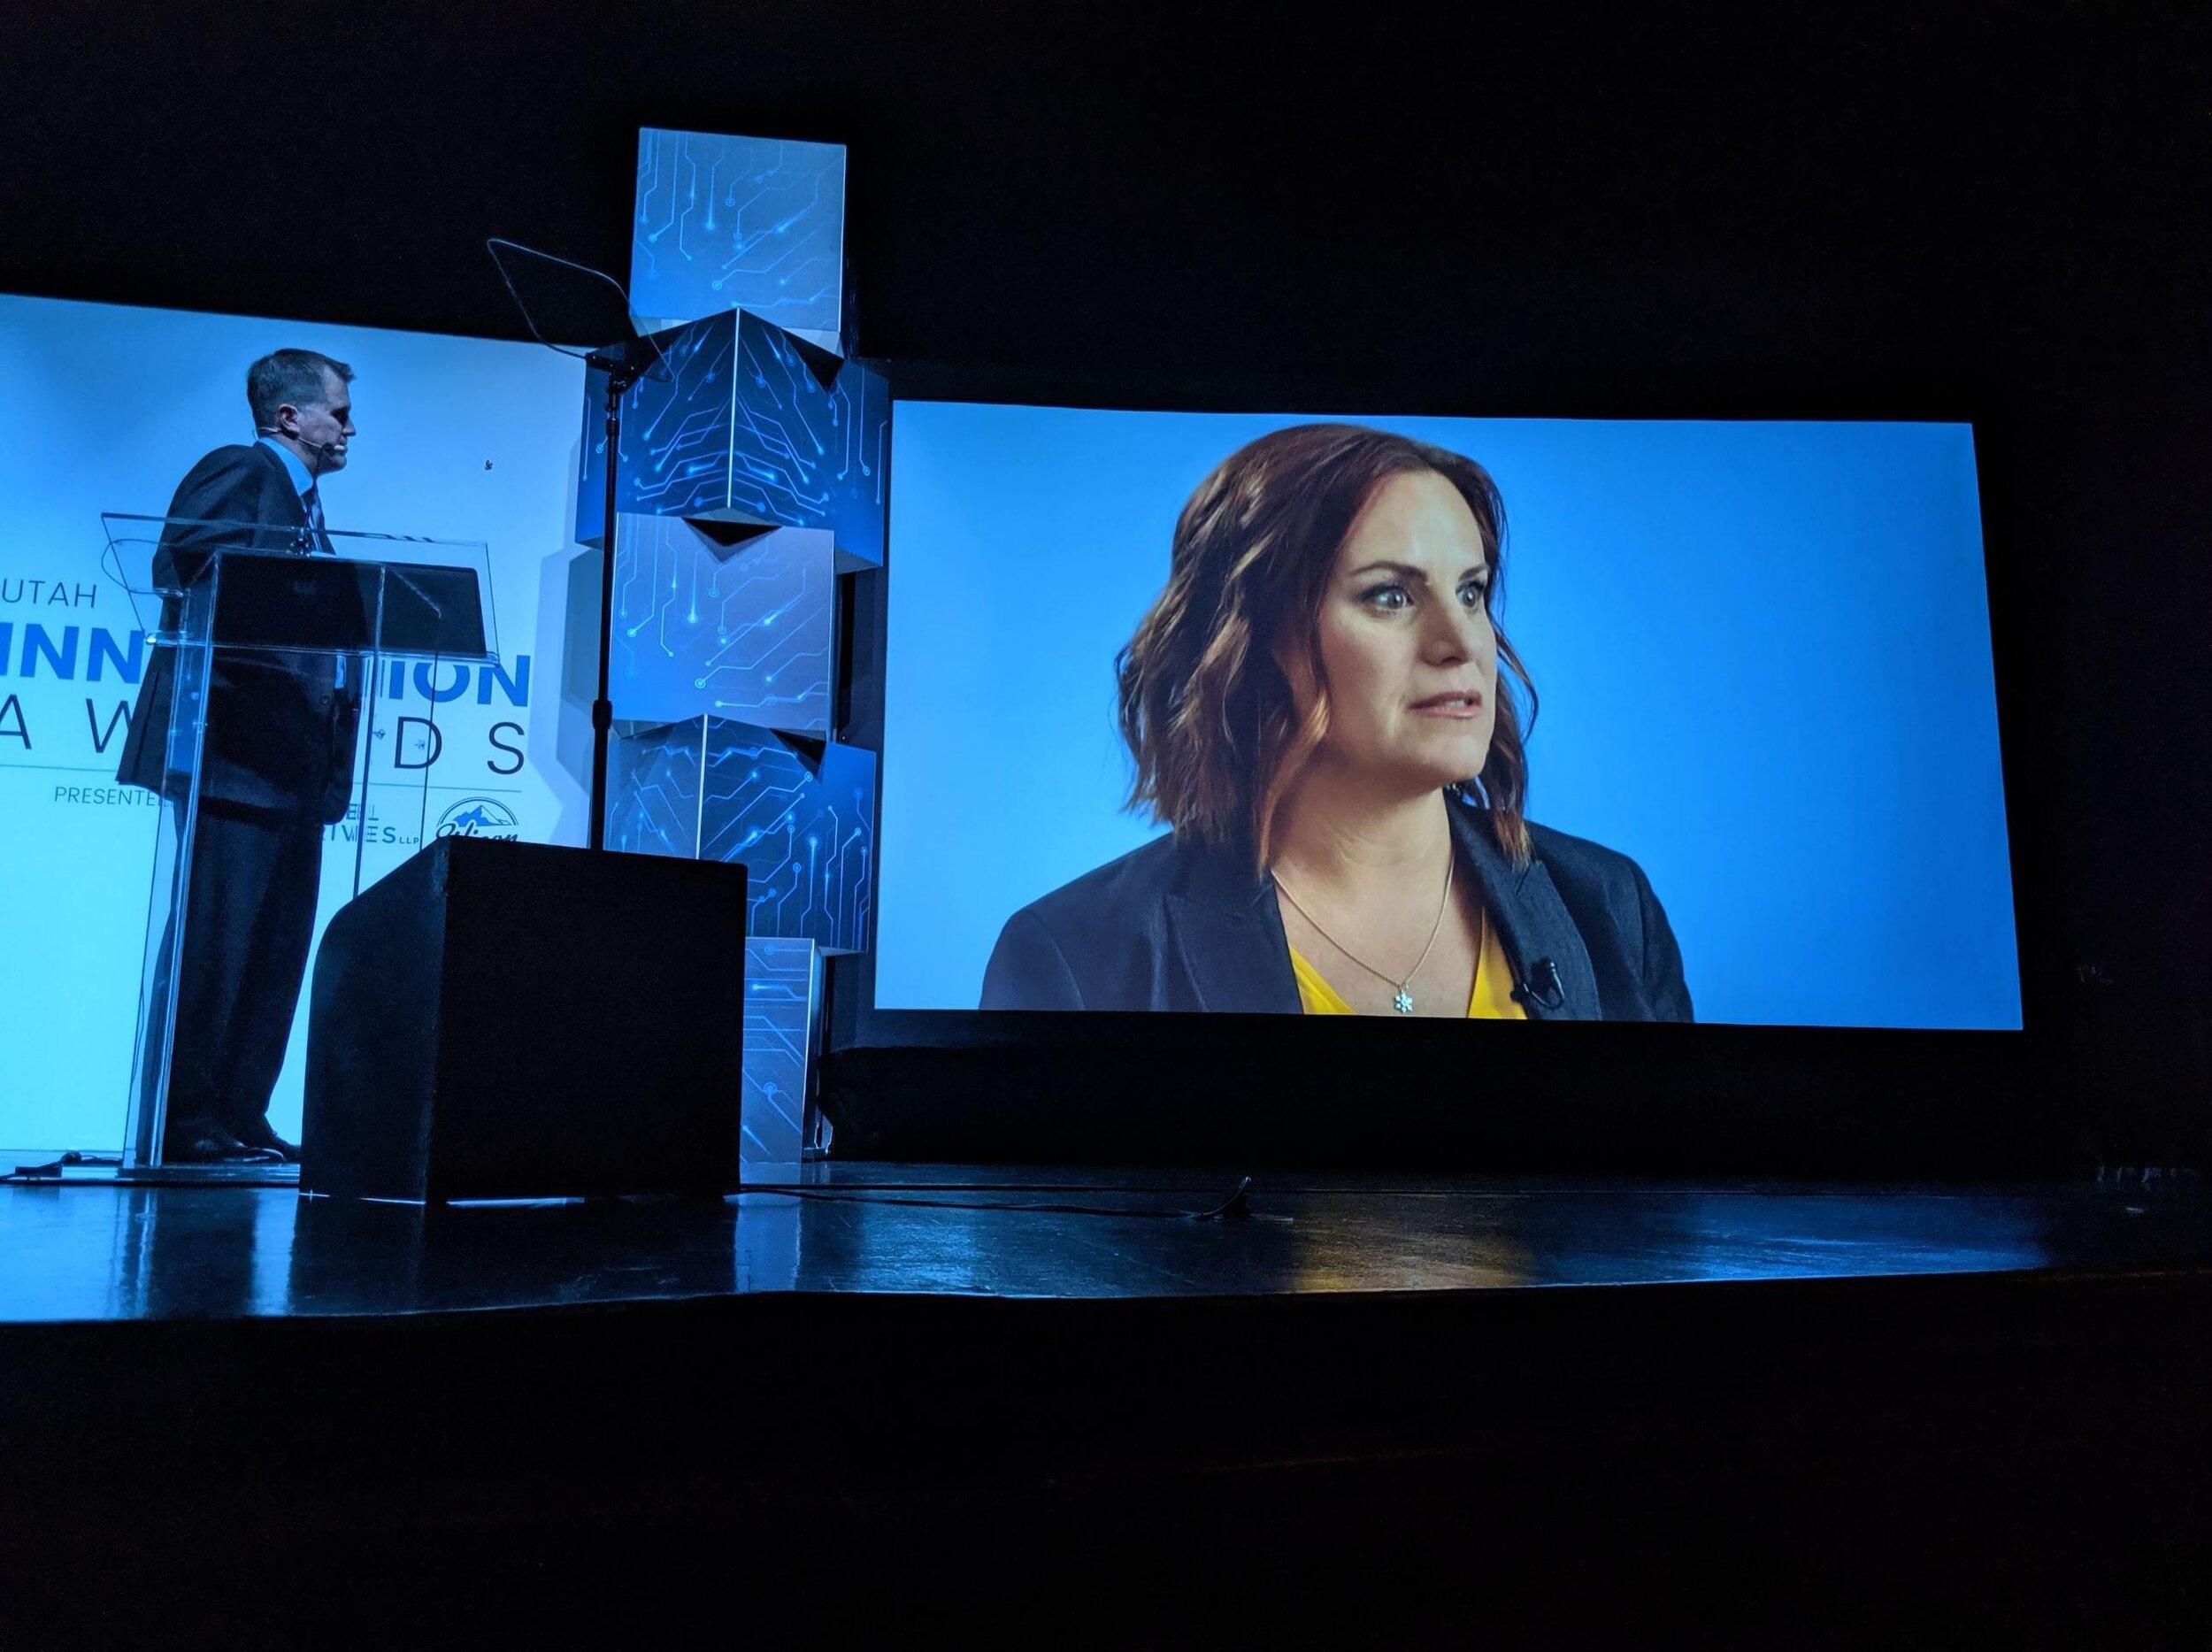 Tara Spalding's encouraging words presented to 400 + entrepreneurs during the award ceremony.